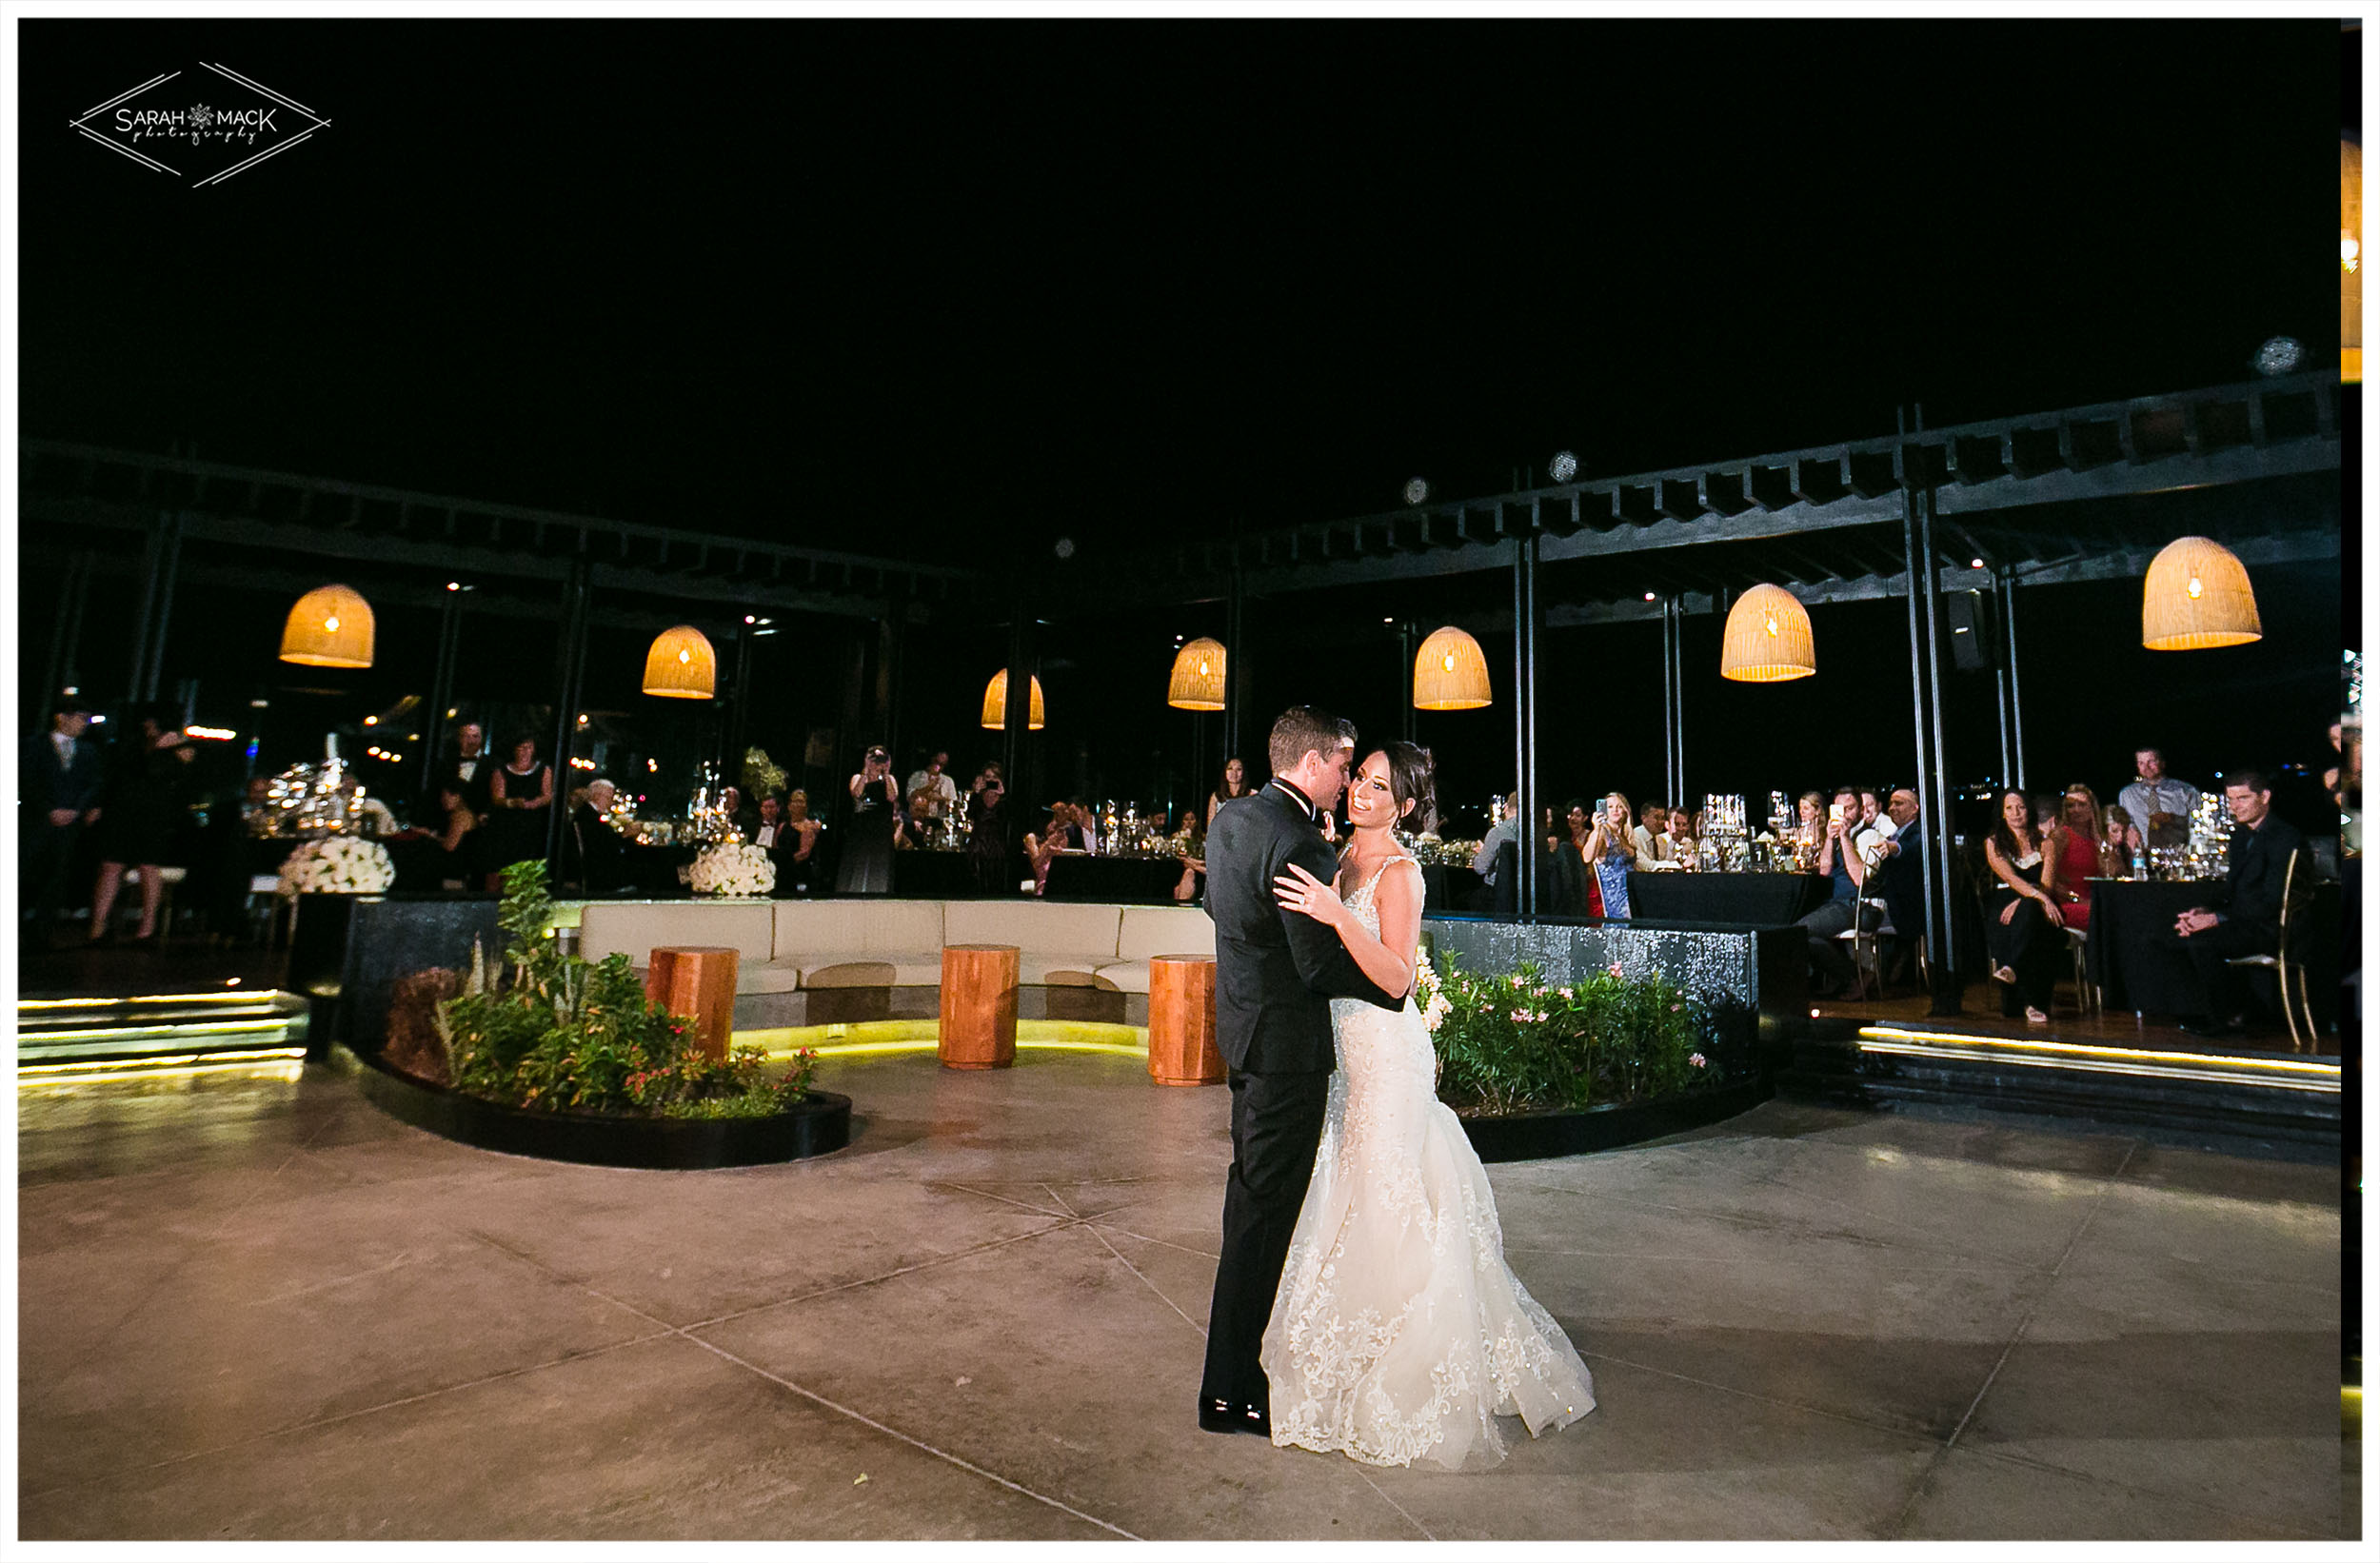 LJ-The-Cape-Hotel-Cabo-San-Lucas-Wedding-51.jpg